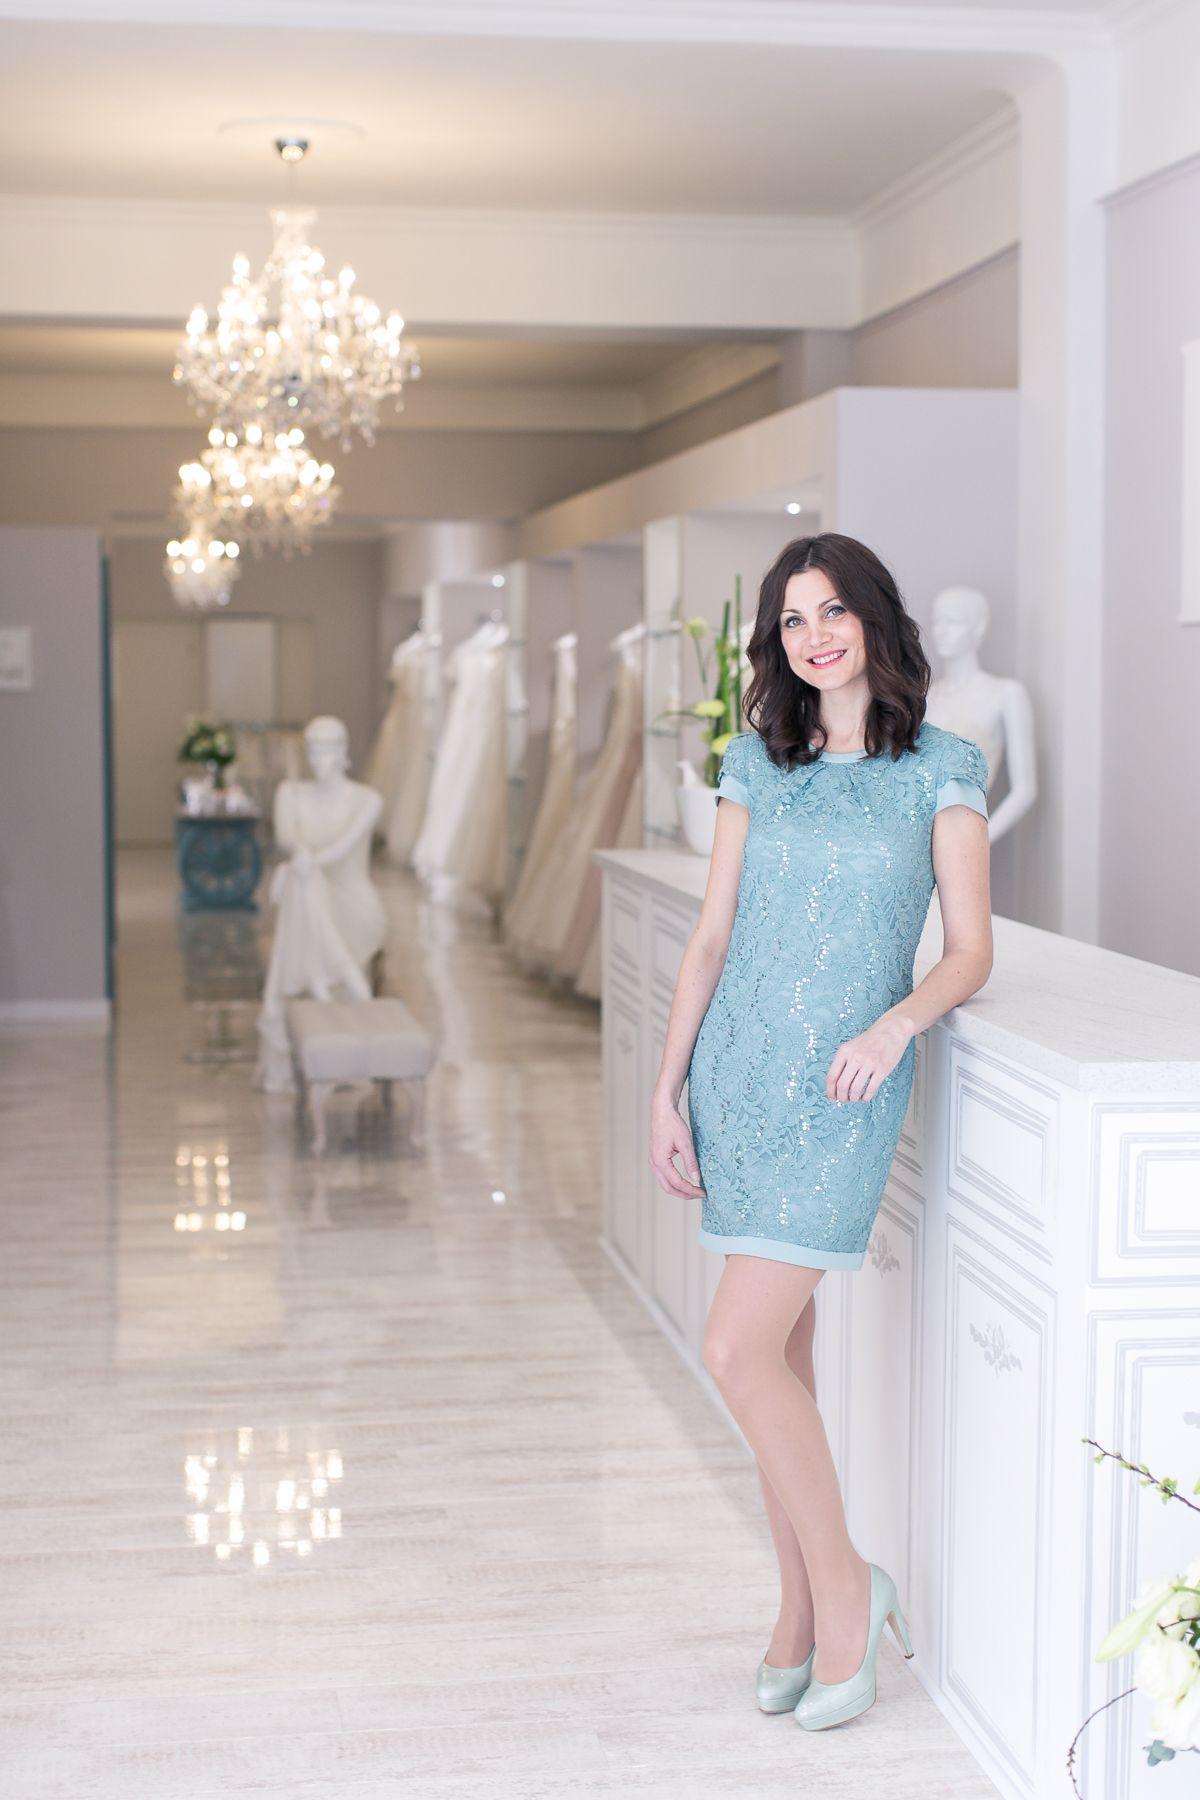 Brautblute Concept Boutique Www Brautbluete De Www Facebook Com